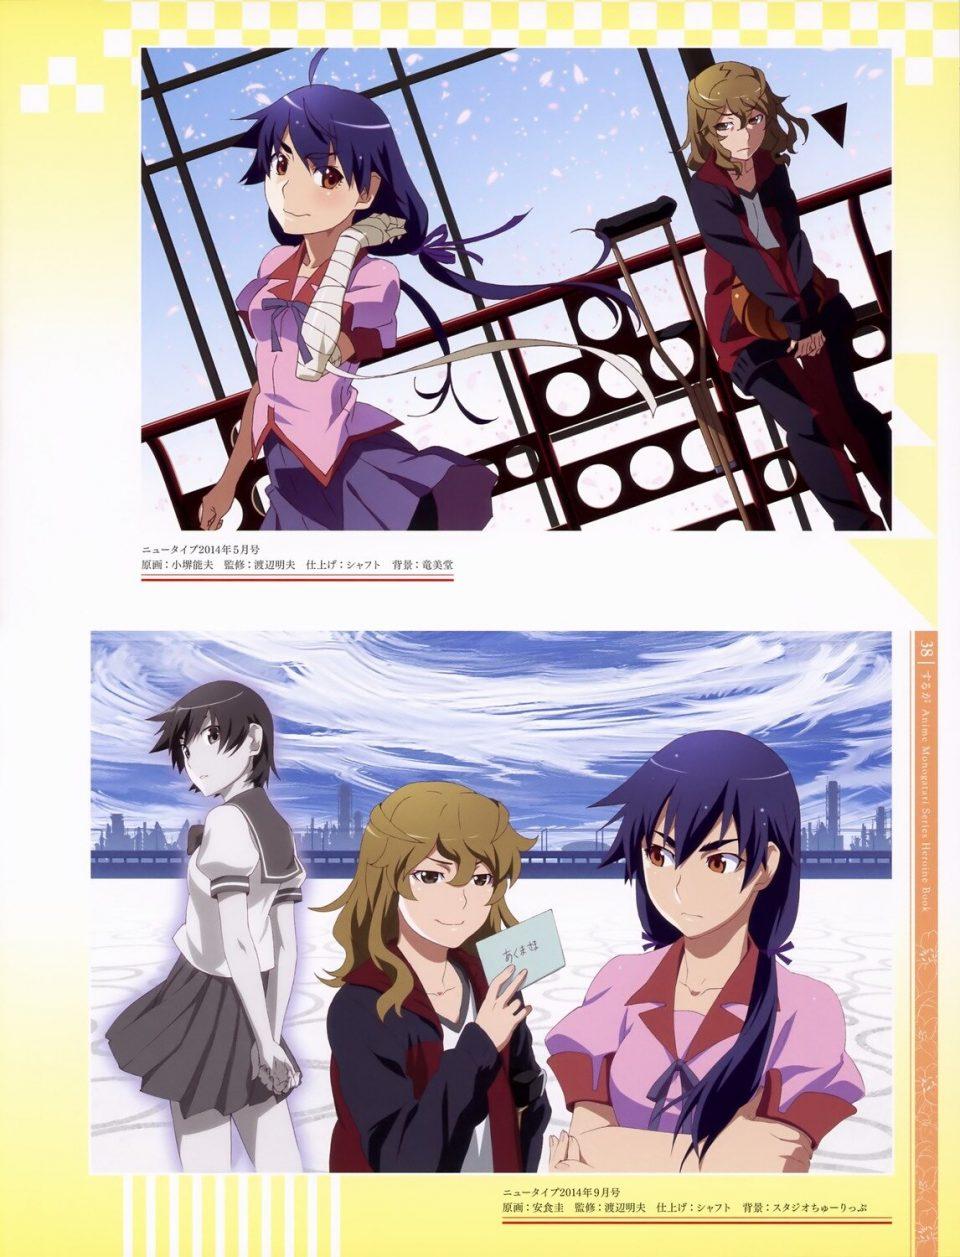 Monogatari Series Heroine Book Kanbaru Suruga